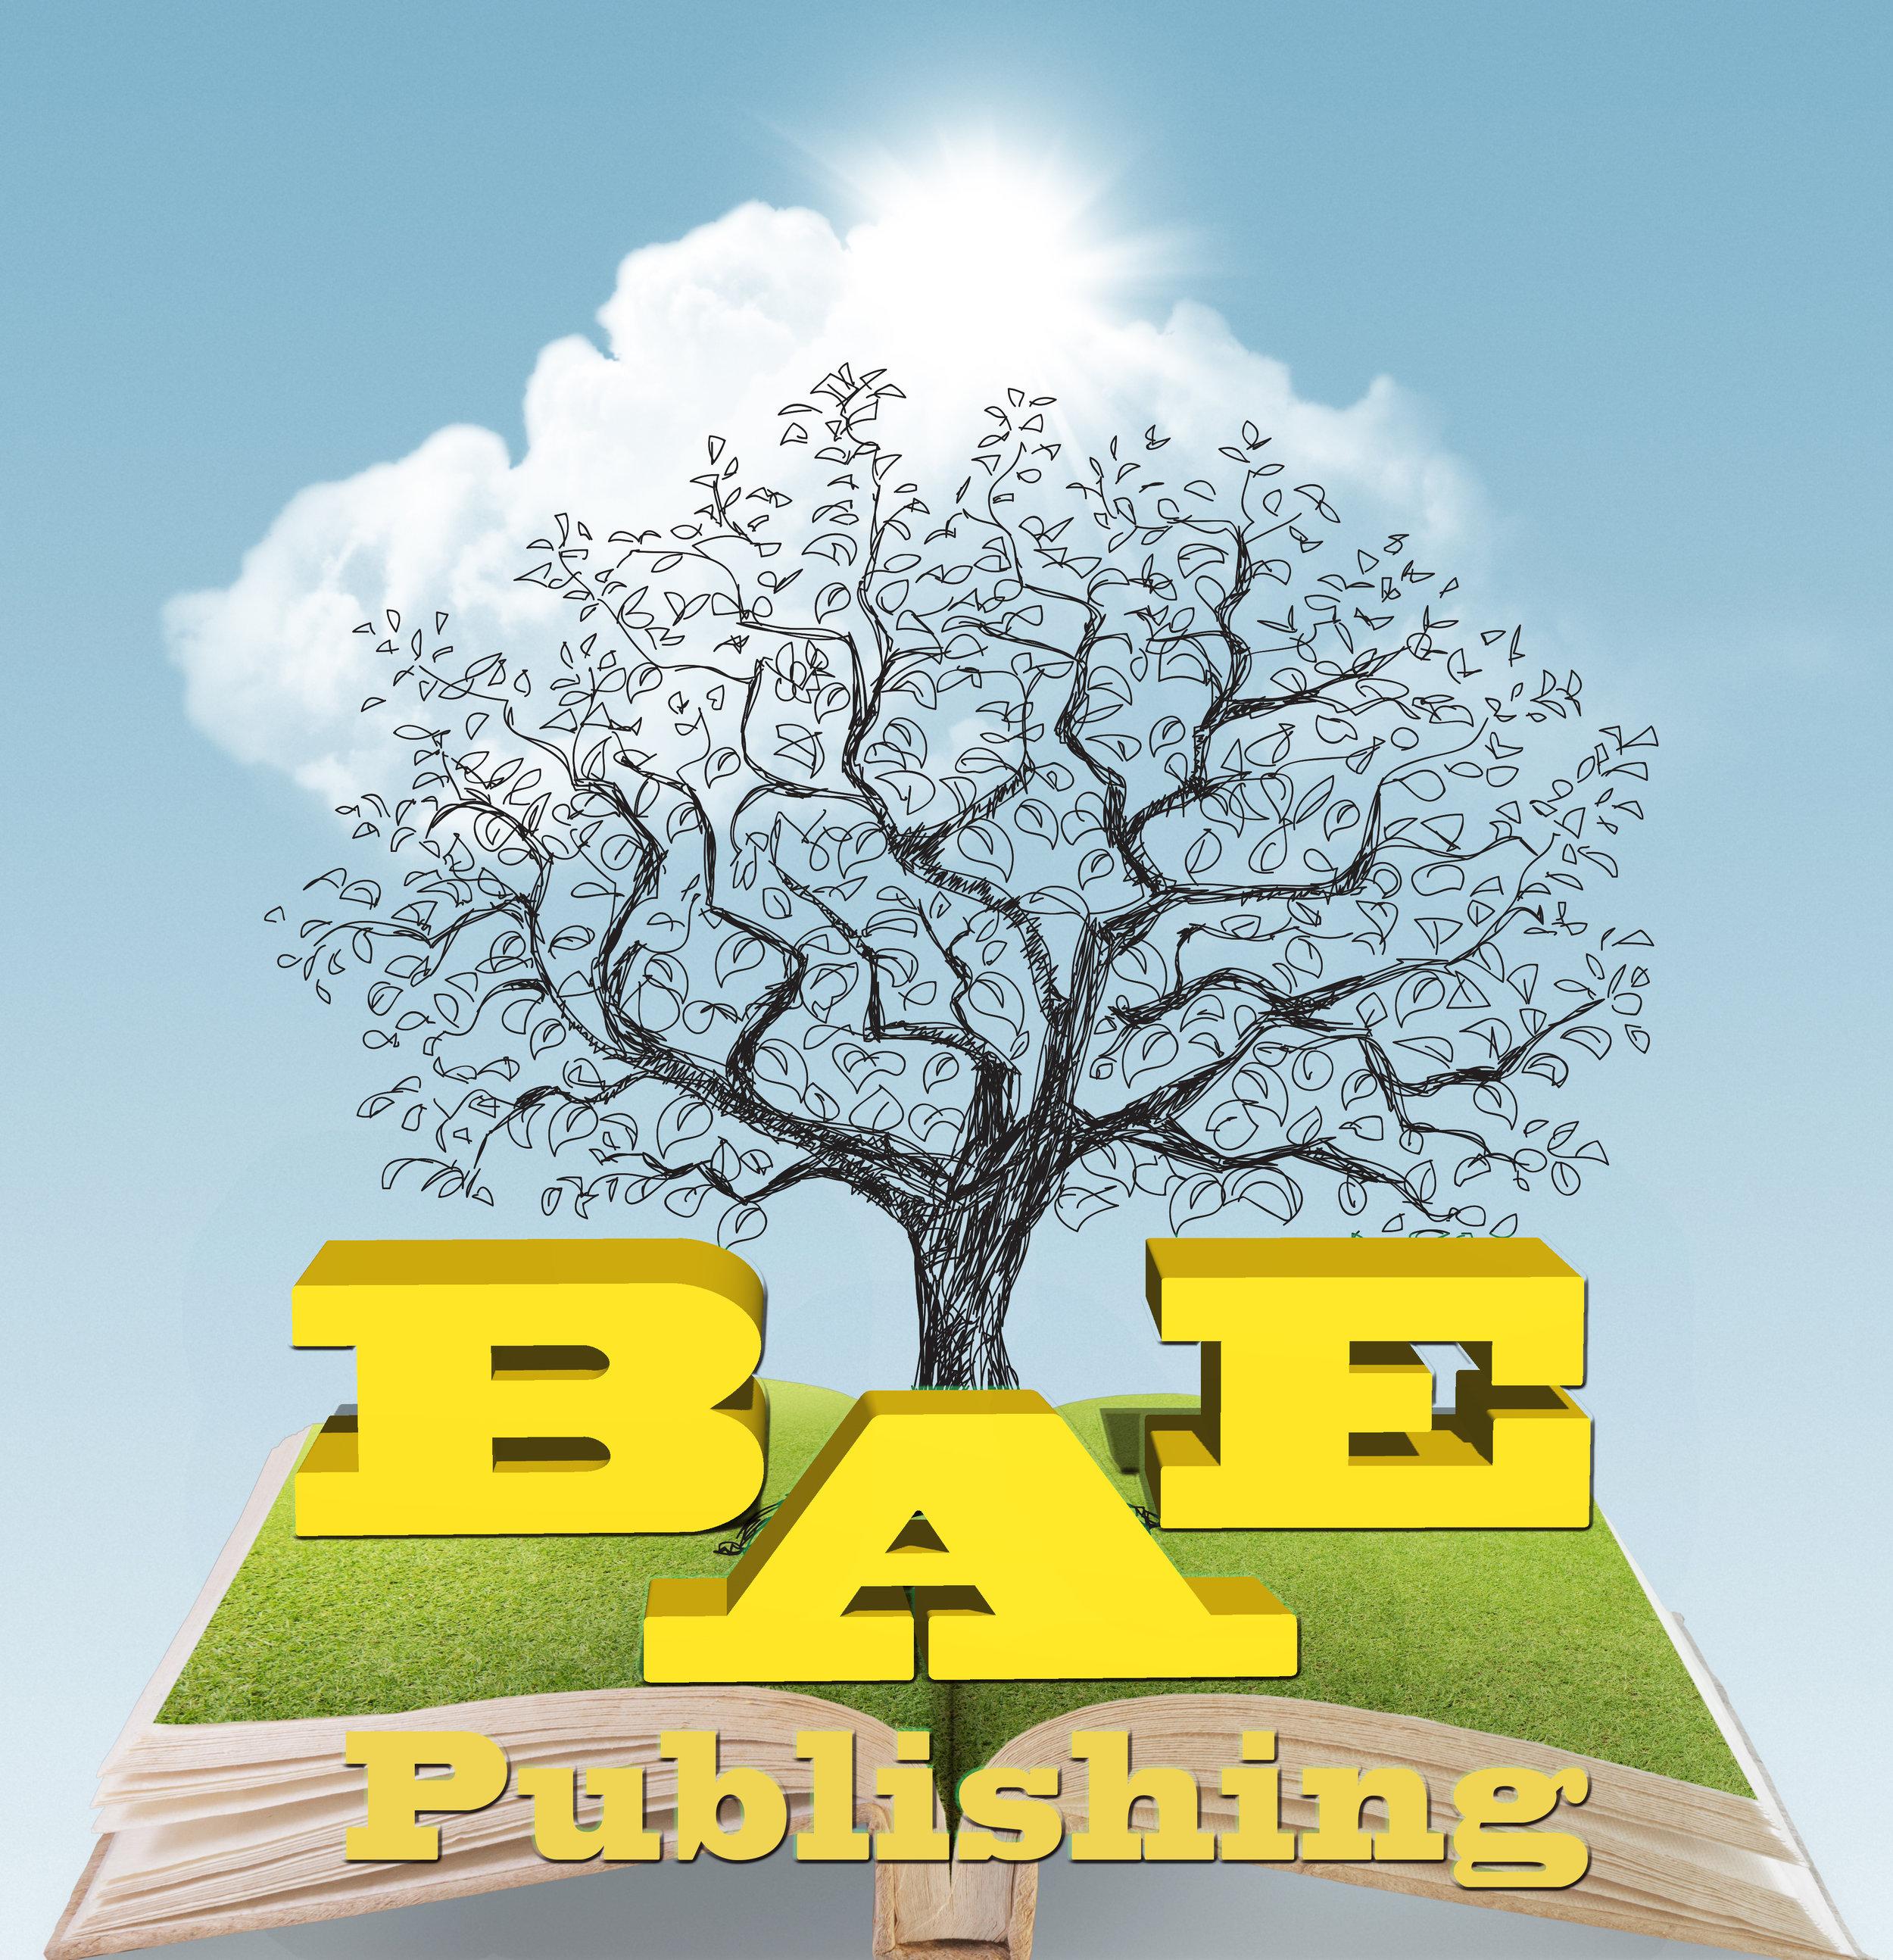 ABE_Publish_logo.jpg